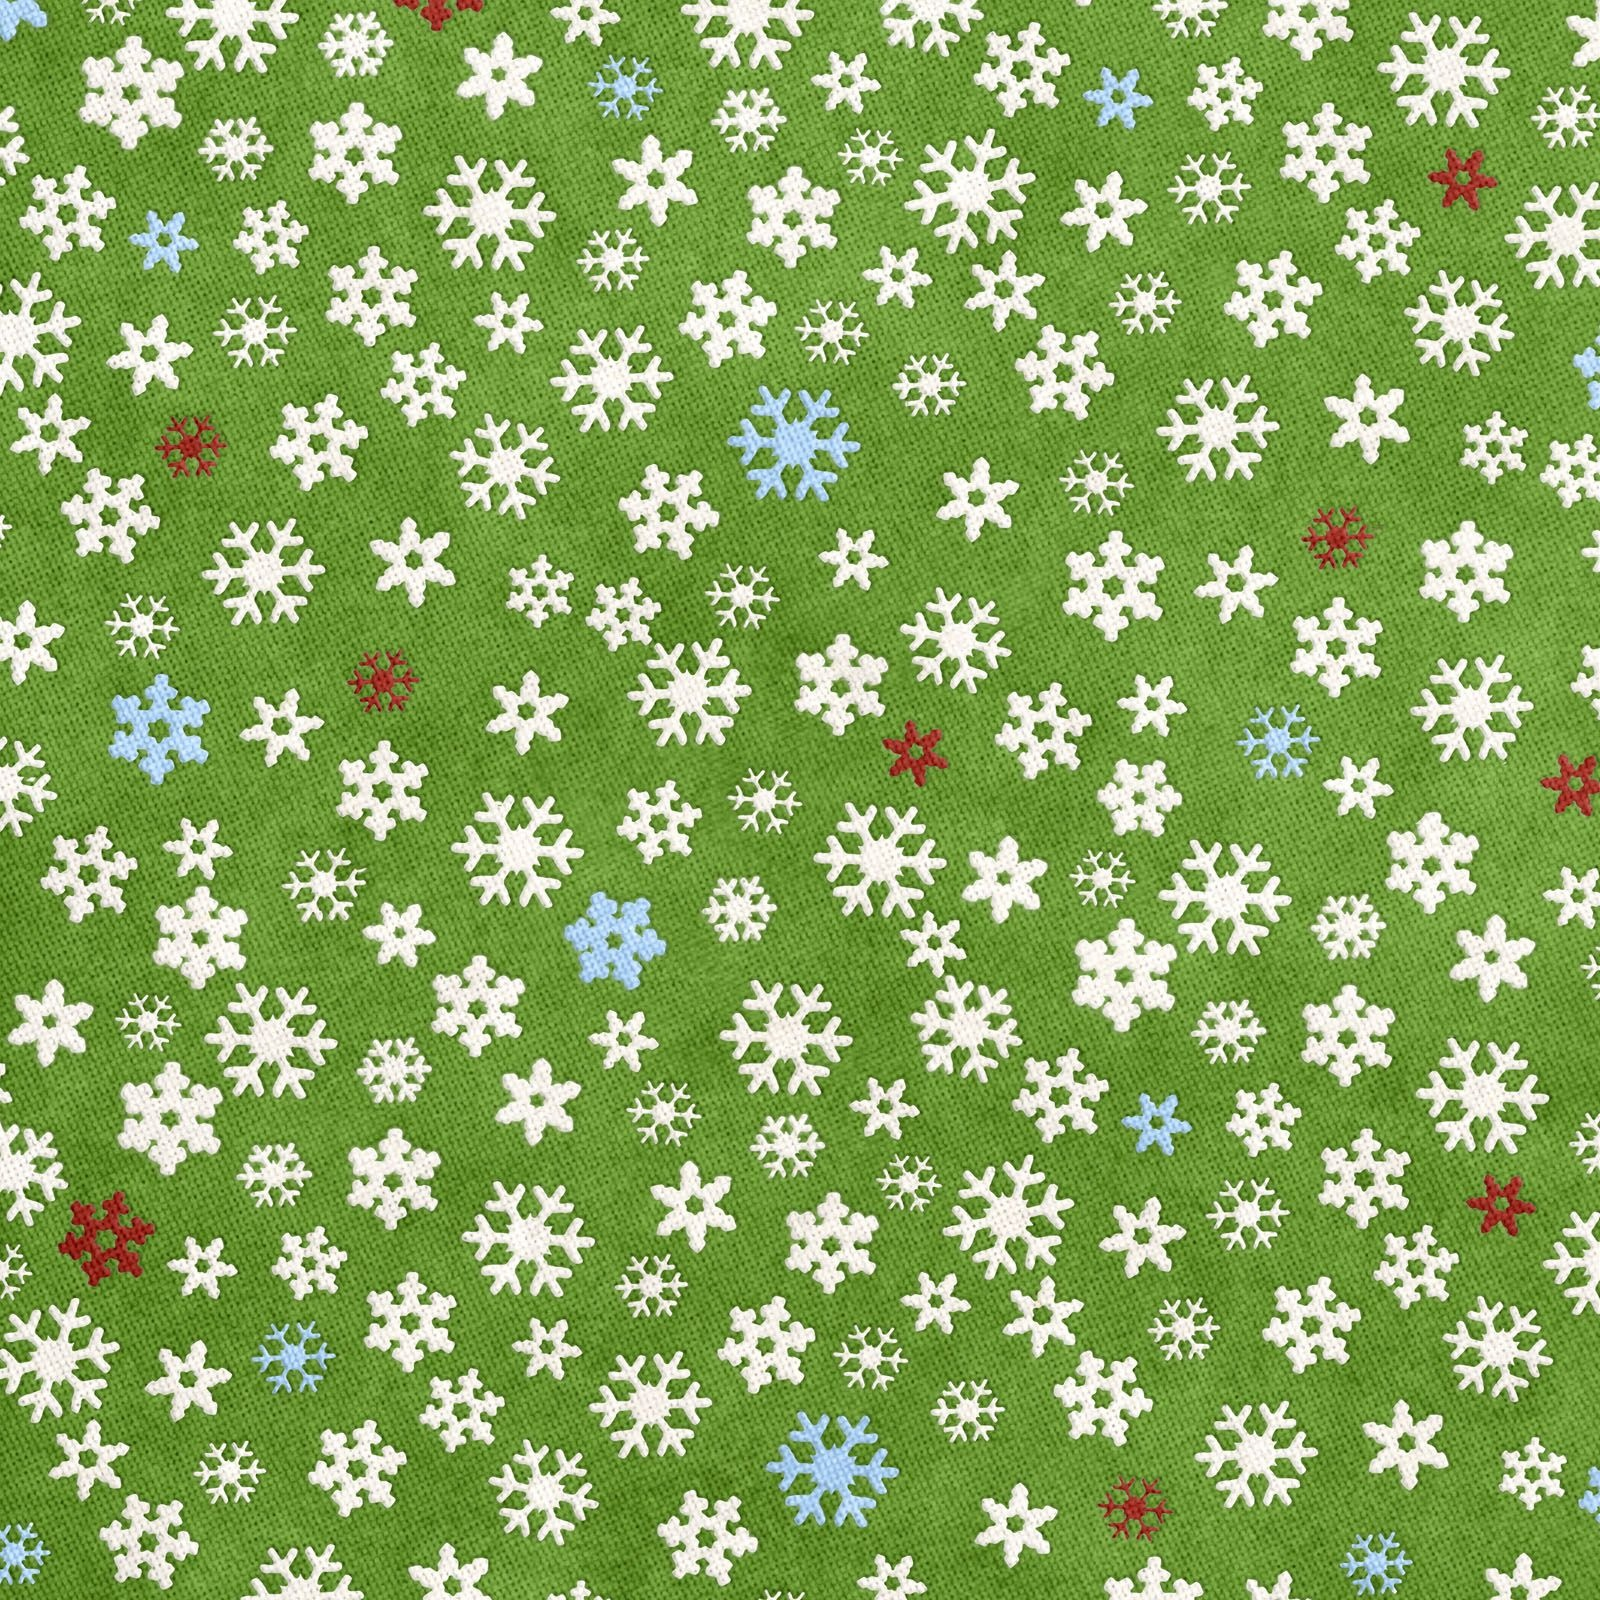 Free Printable Christmas Gift Wrapping Paper - Snowflakes On Green - Free Printable Christmas Paper